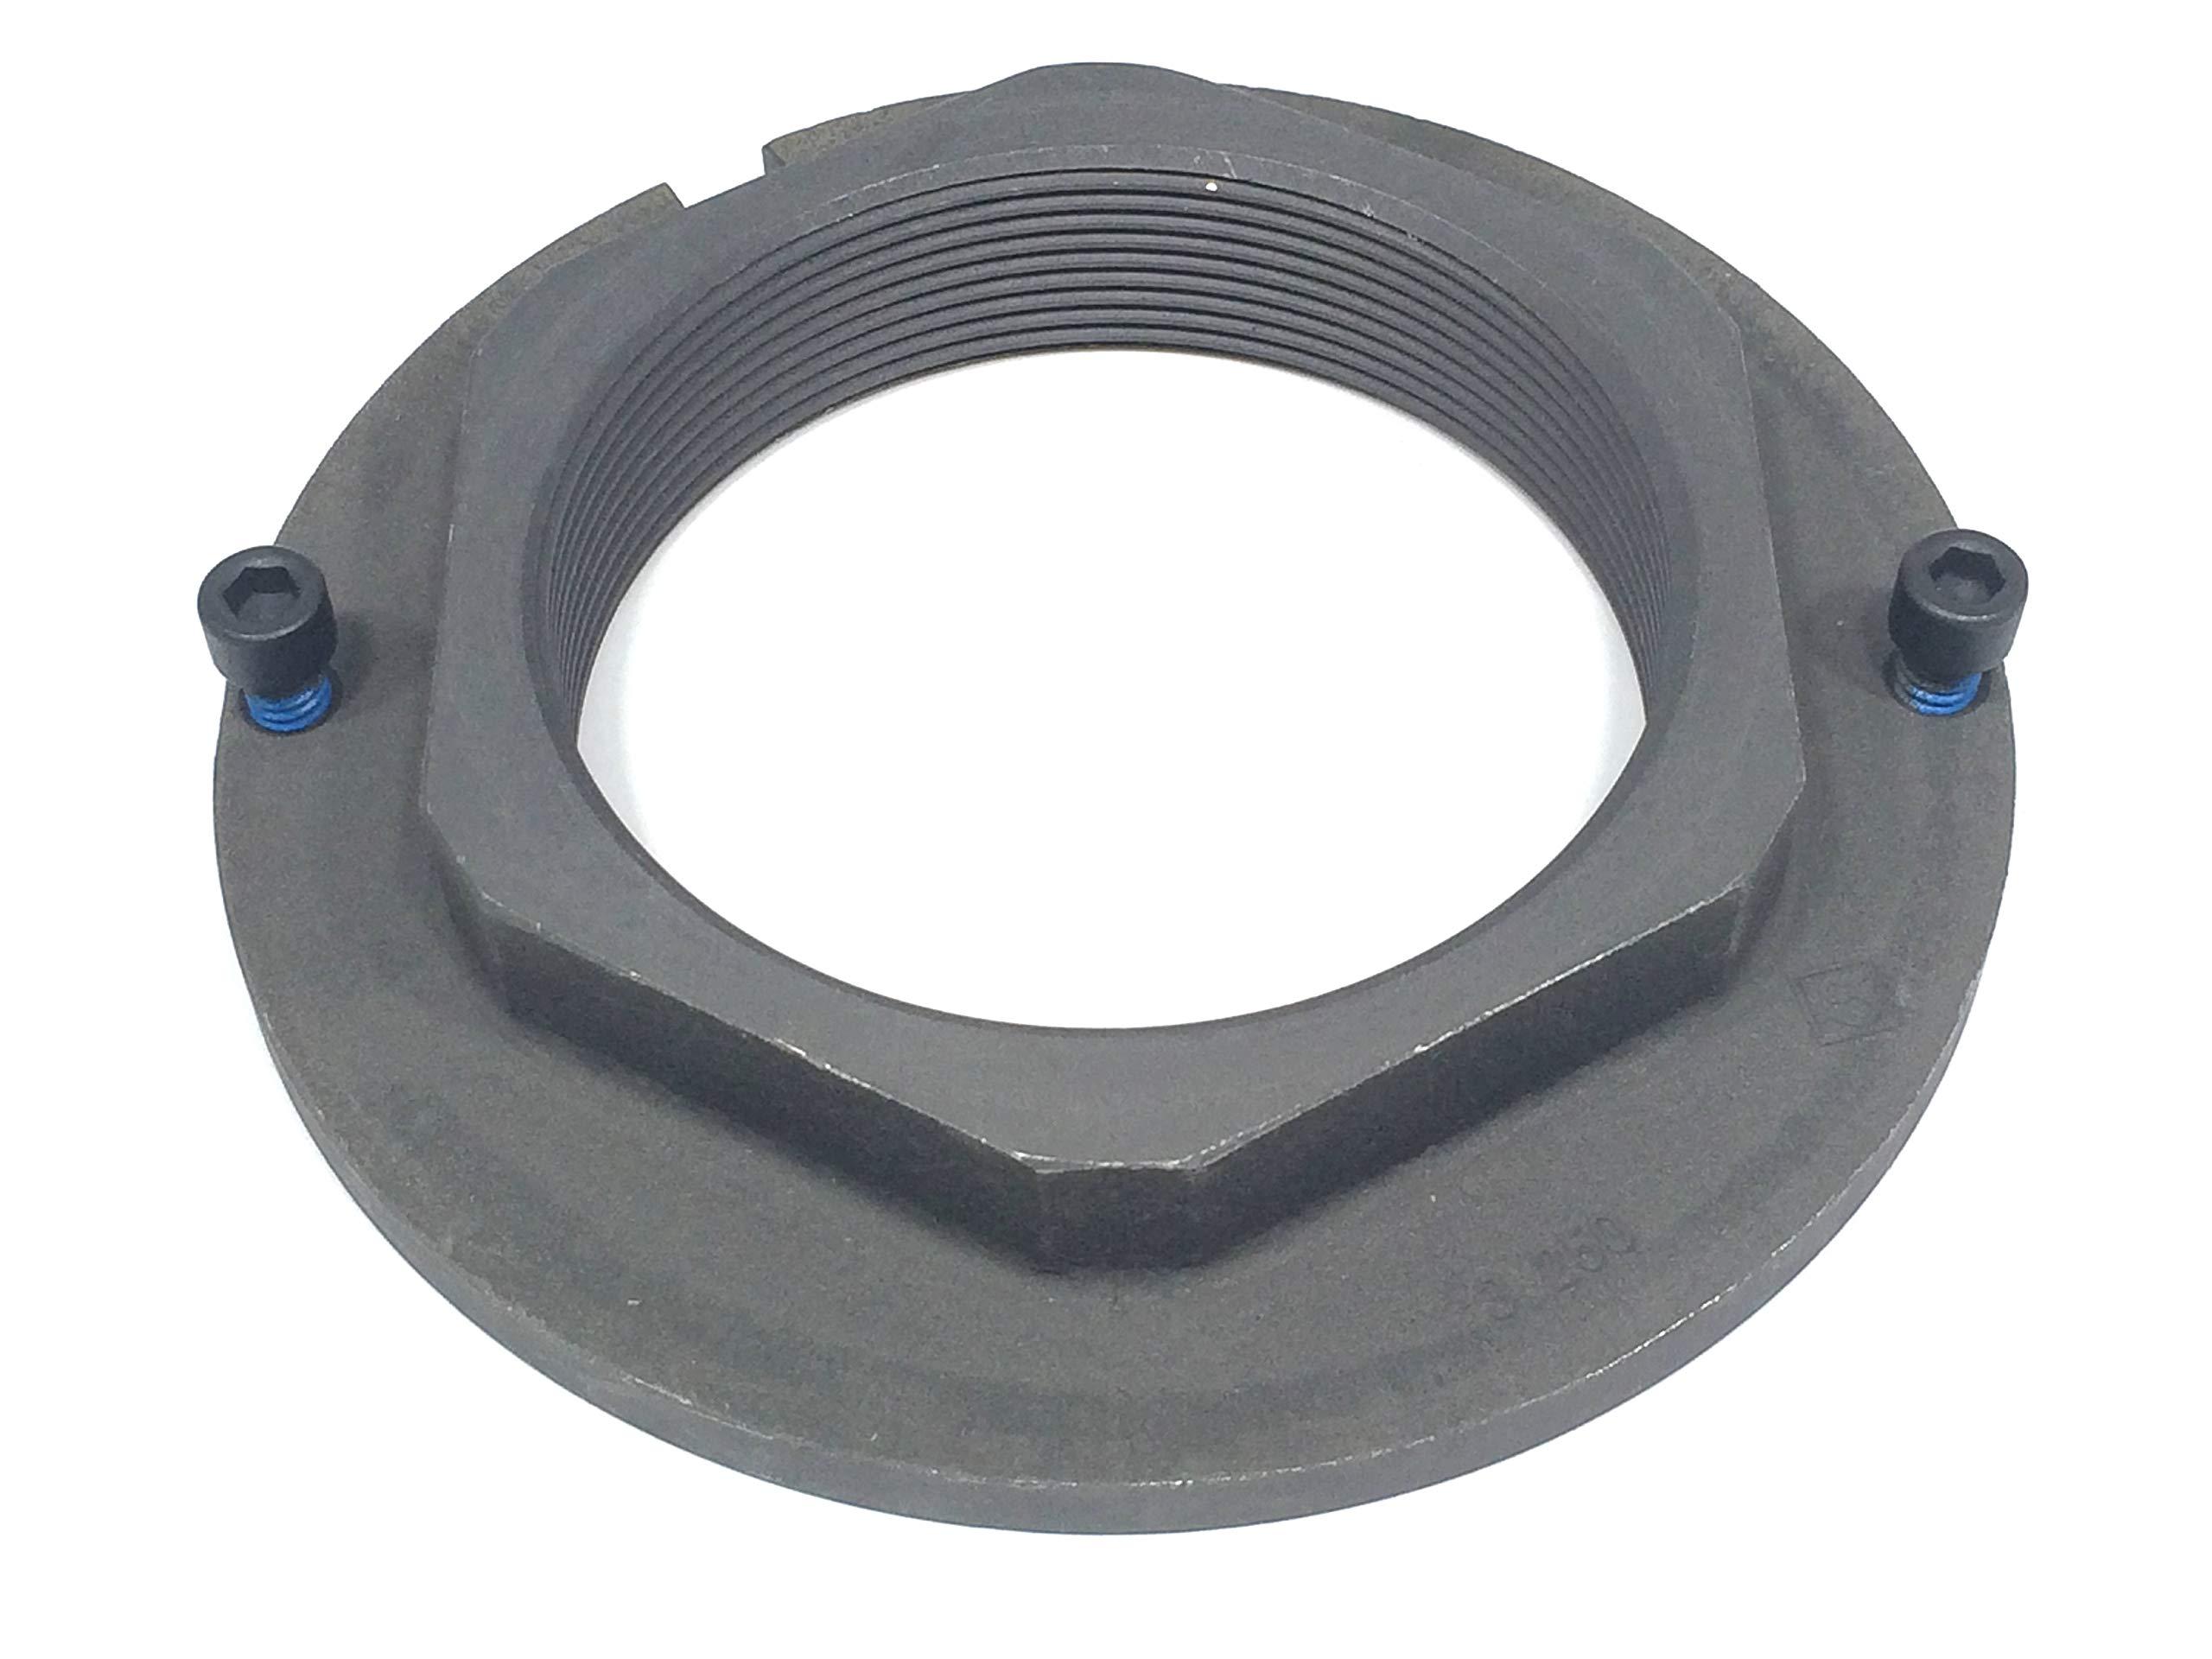 NUT, Rear Axle (3-1/4inThread) Use with MAK25QJ232